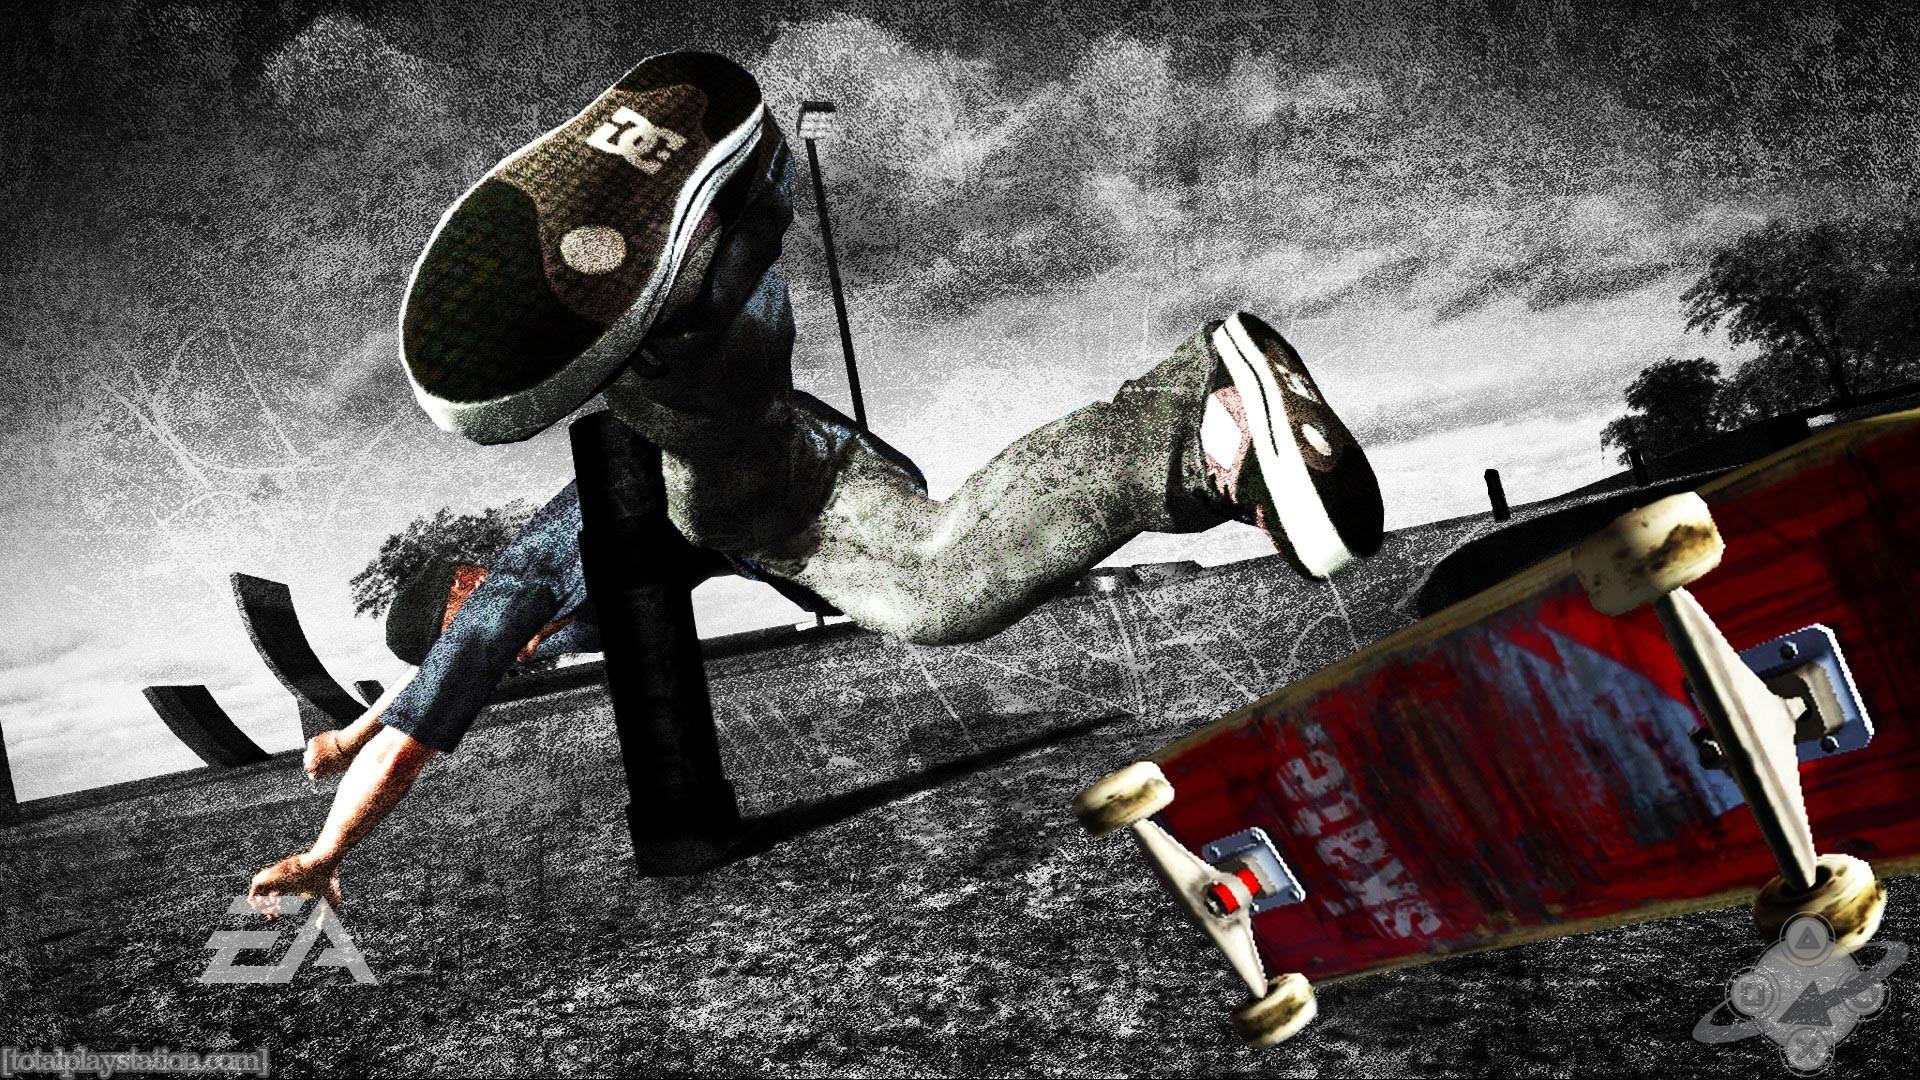 Wallpapers Skateboarding Vans Fond Ecran Skateur Skateboard Hd ..